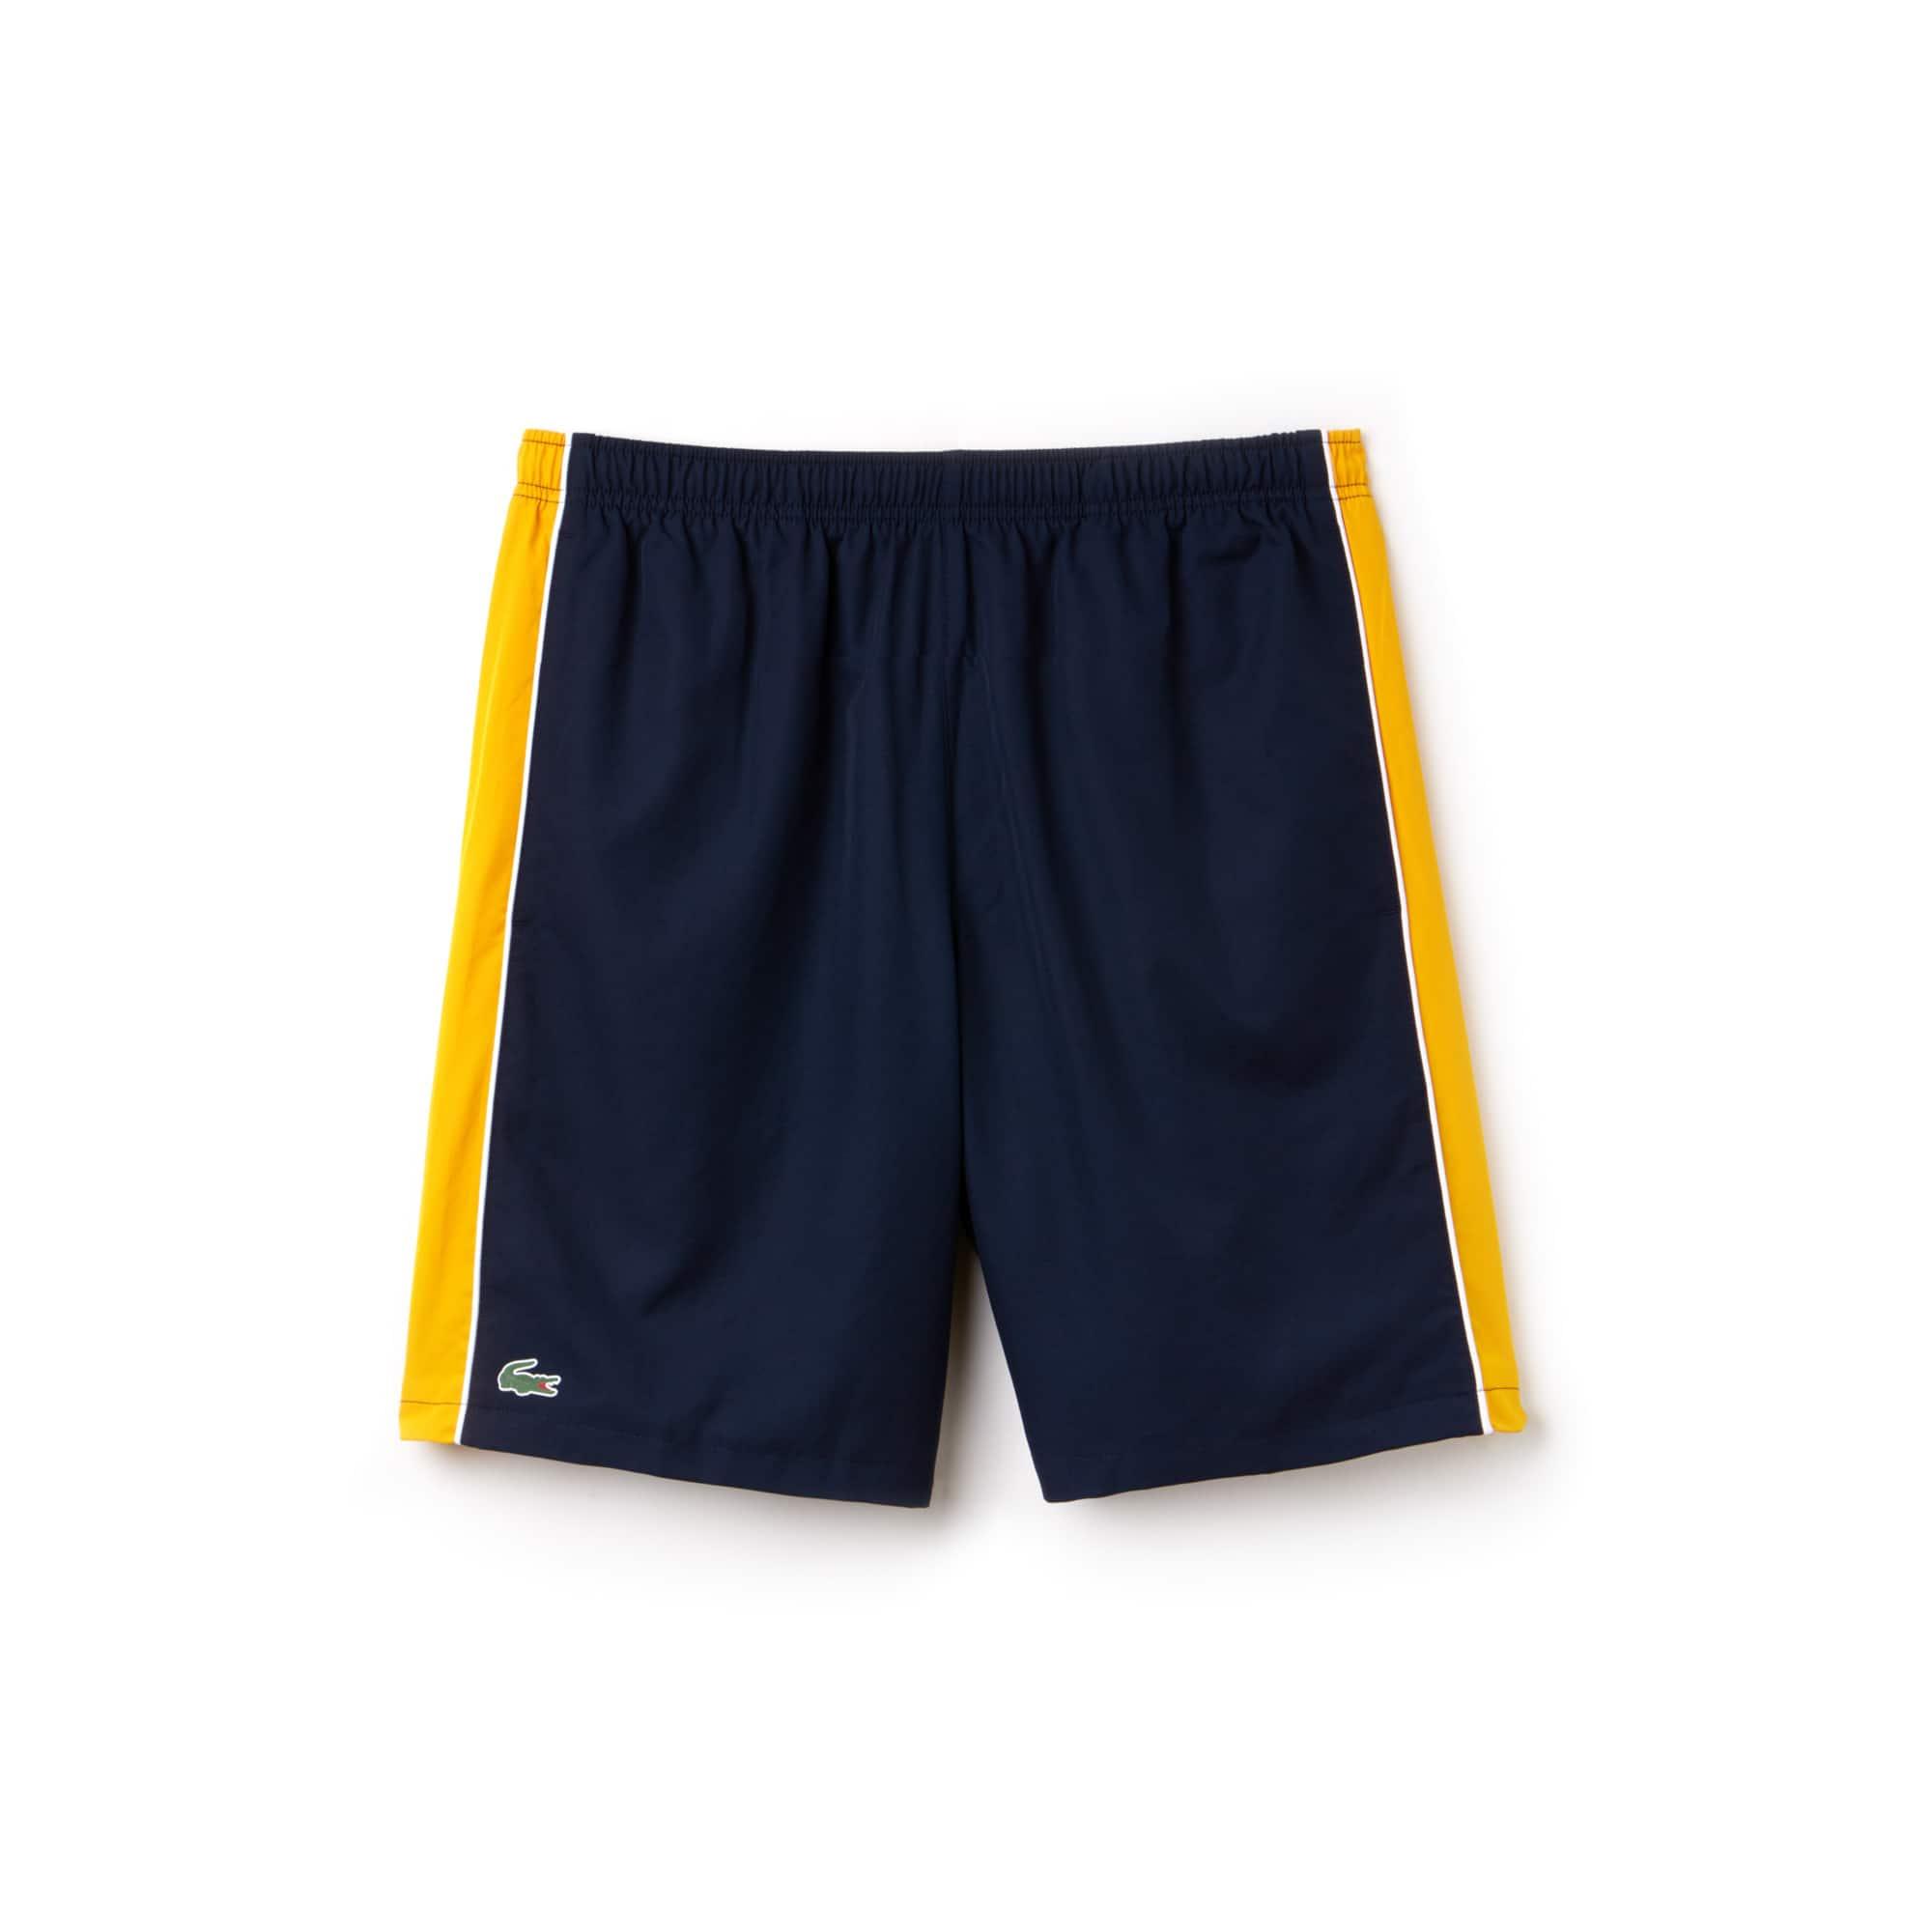 Herren LACOSTE SPORT NOVAK DJOKOVIC COLLECTION Colorblock Shorts